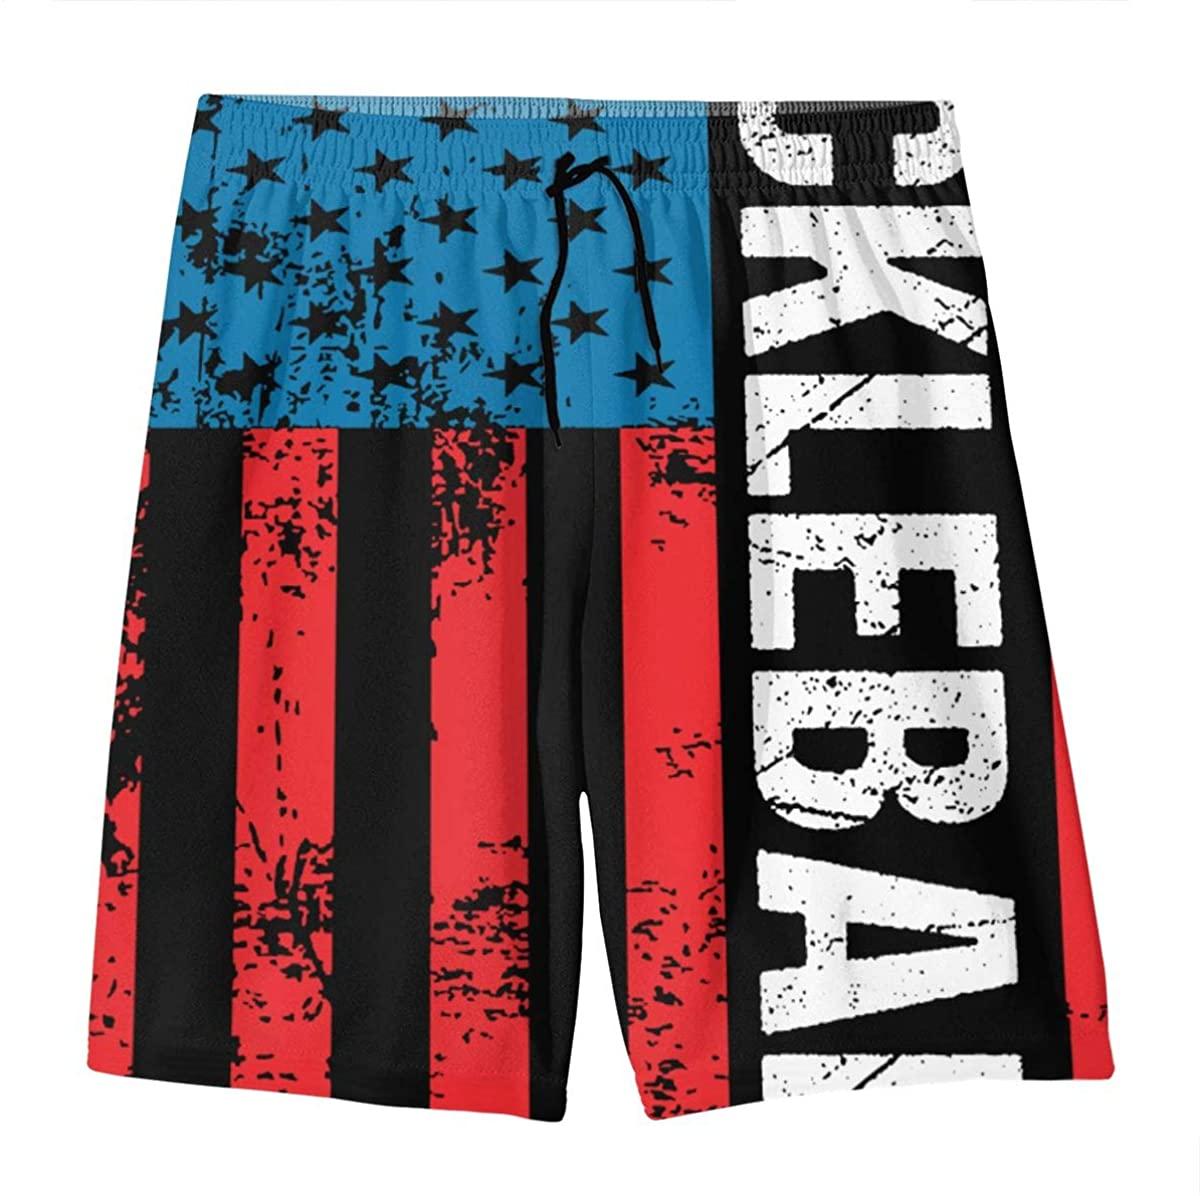 YOIGNG Pickleball Retro American Flag Teens Swim Trunks Beach Shorts Surfing Board Quick Dry Bathing Suit